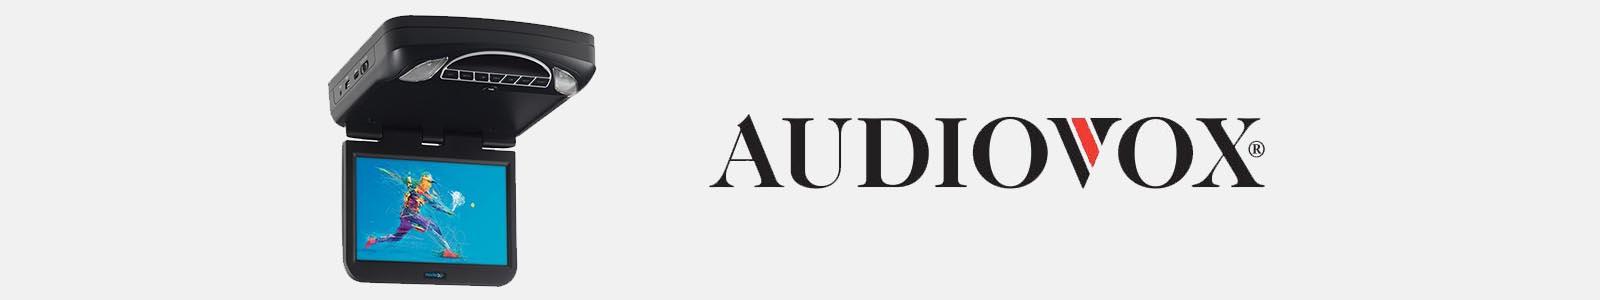 audiovoxoutlet-01-1.jpg